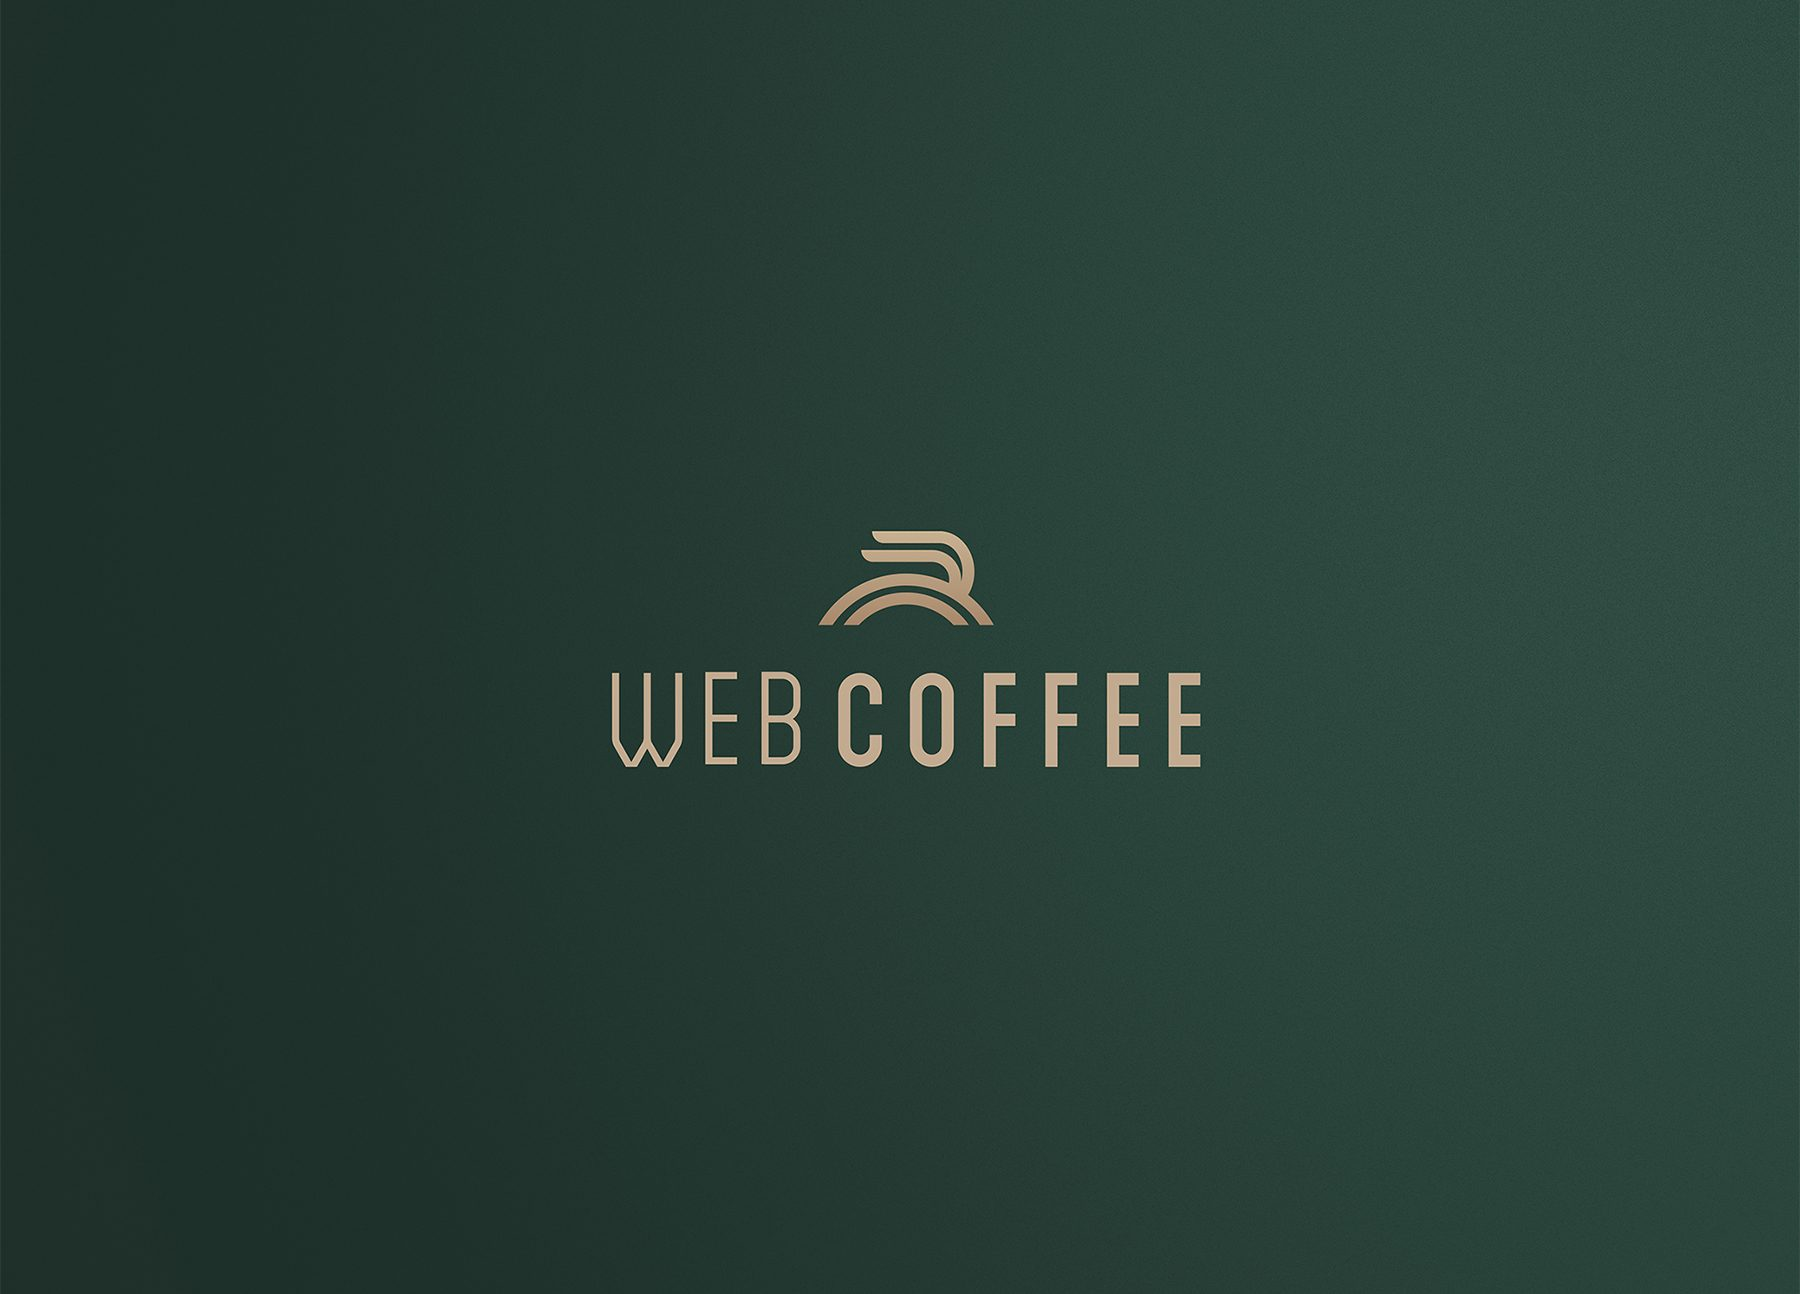 Web Coffee Logo design